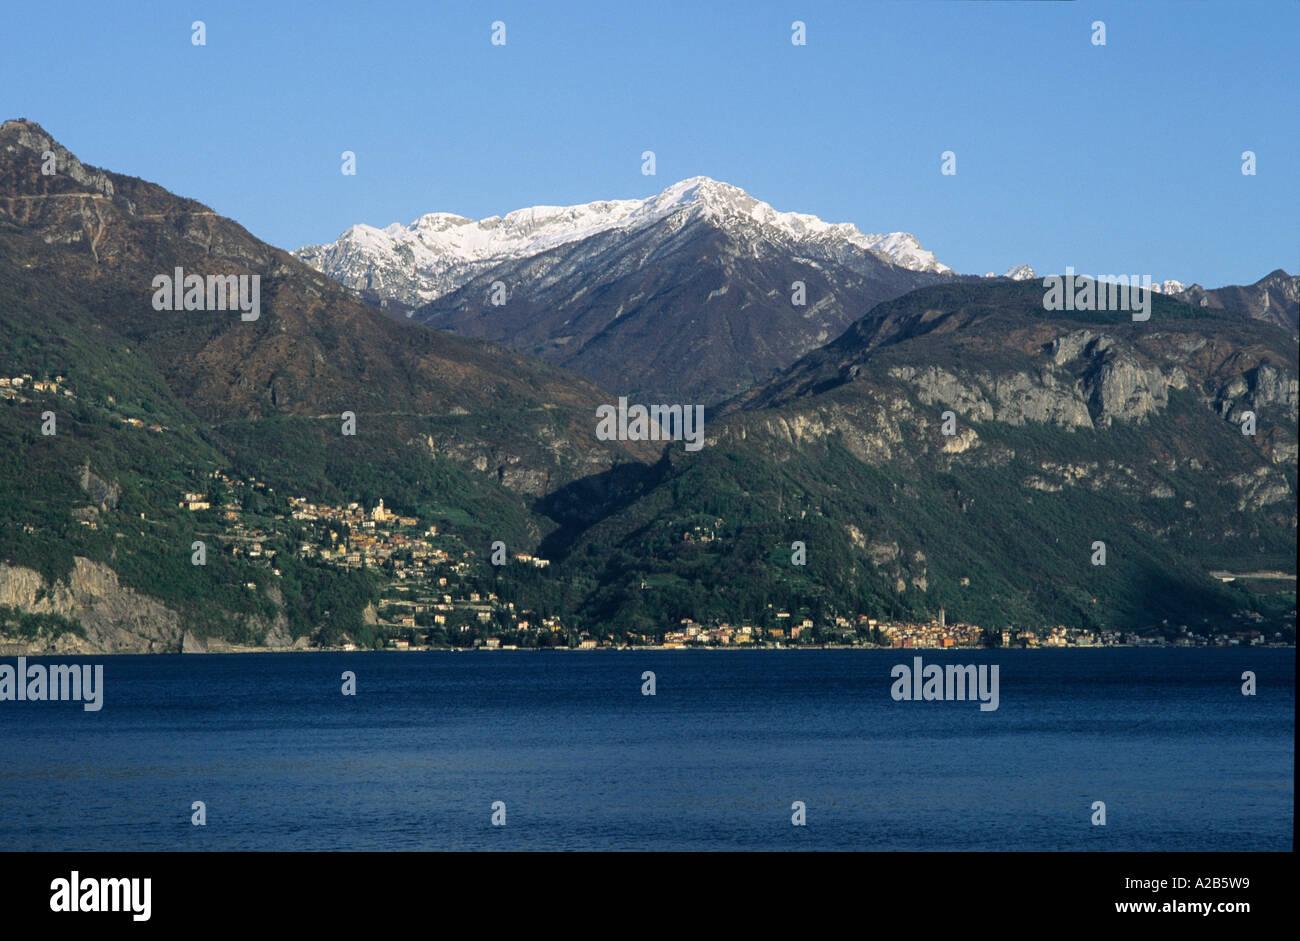 Varenna Grigna mountain Lago di Como Lombardia Italy - Stock Image